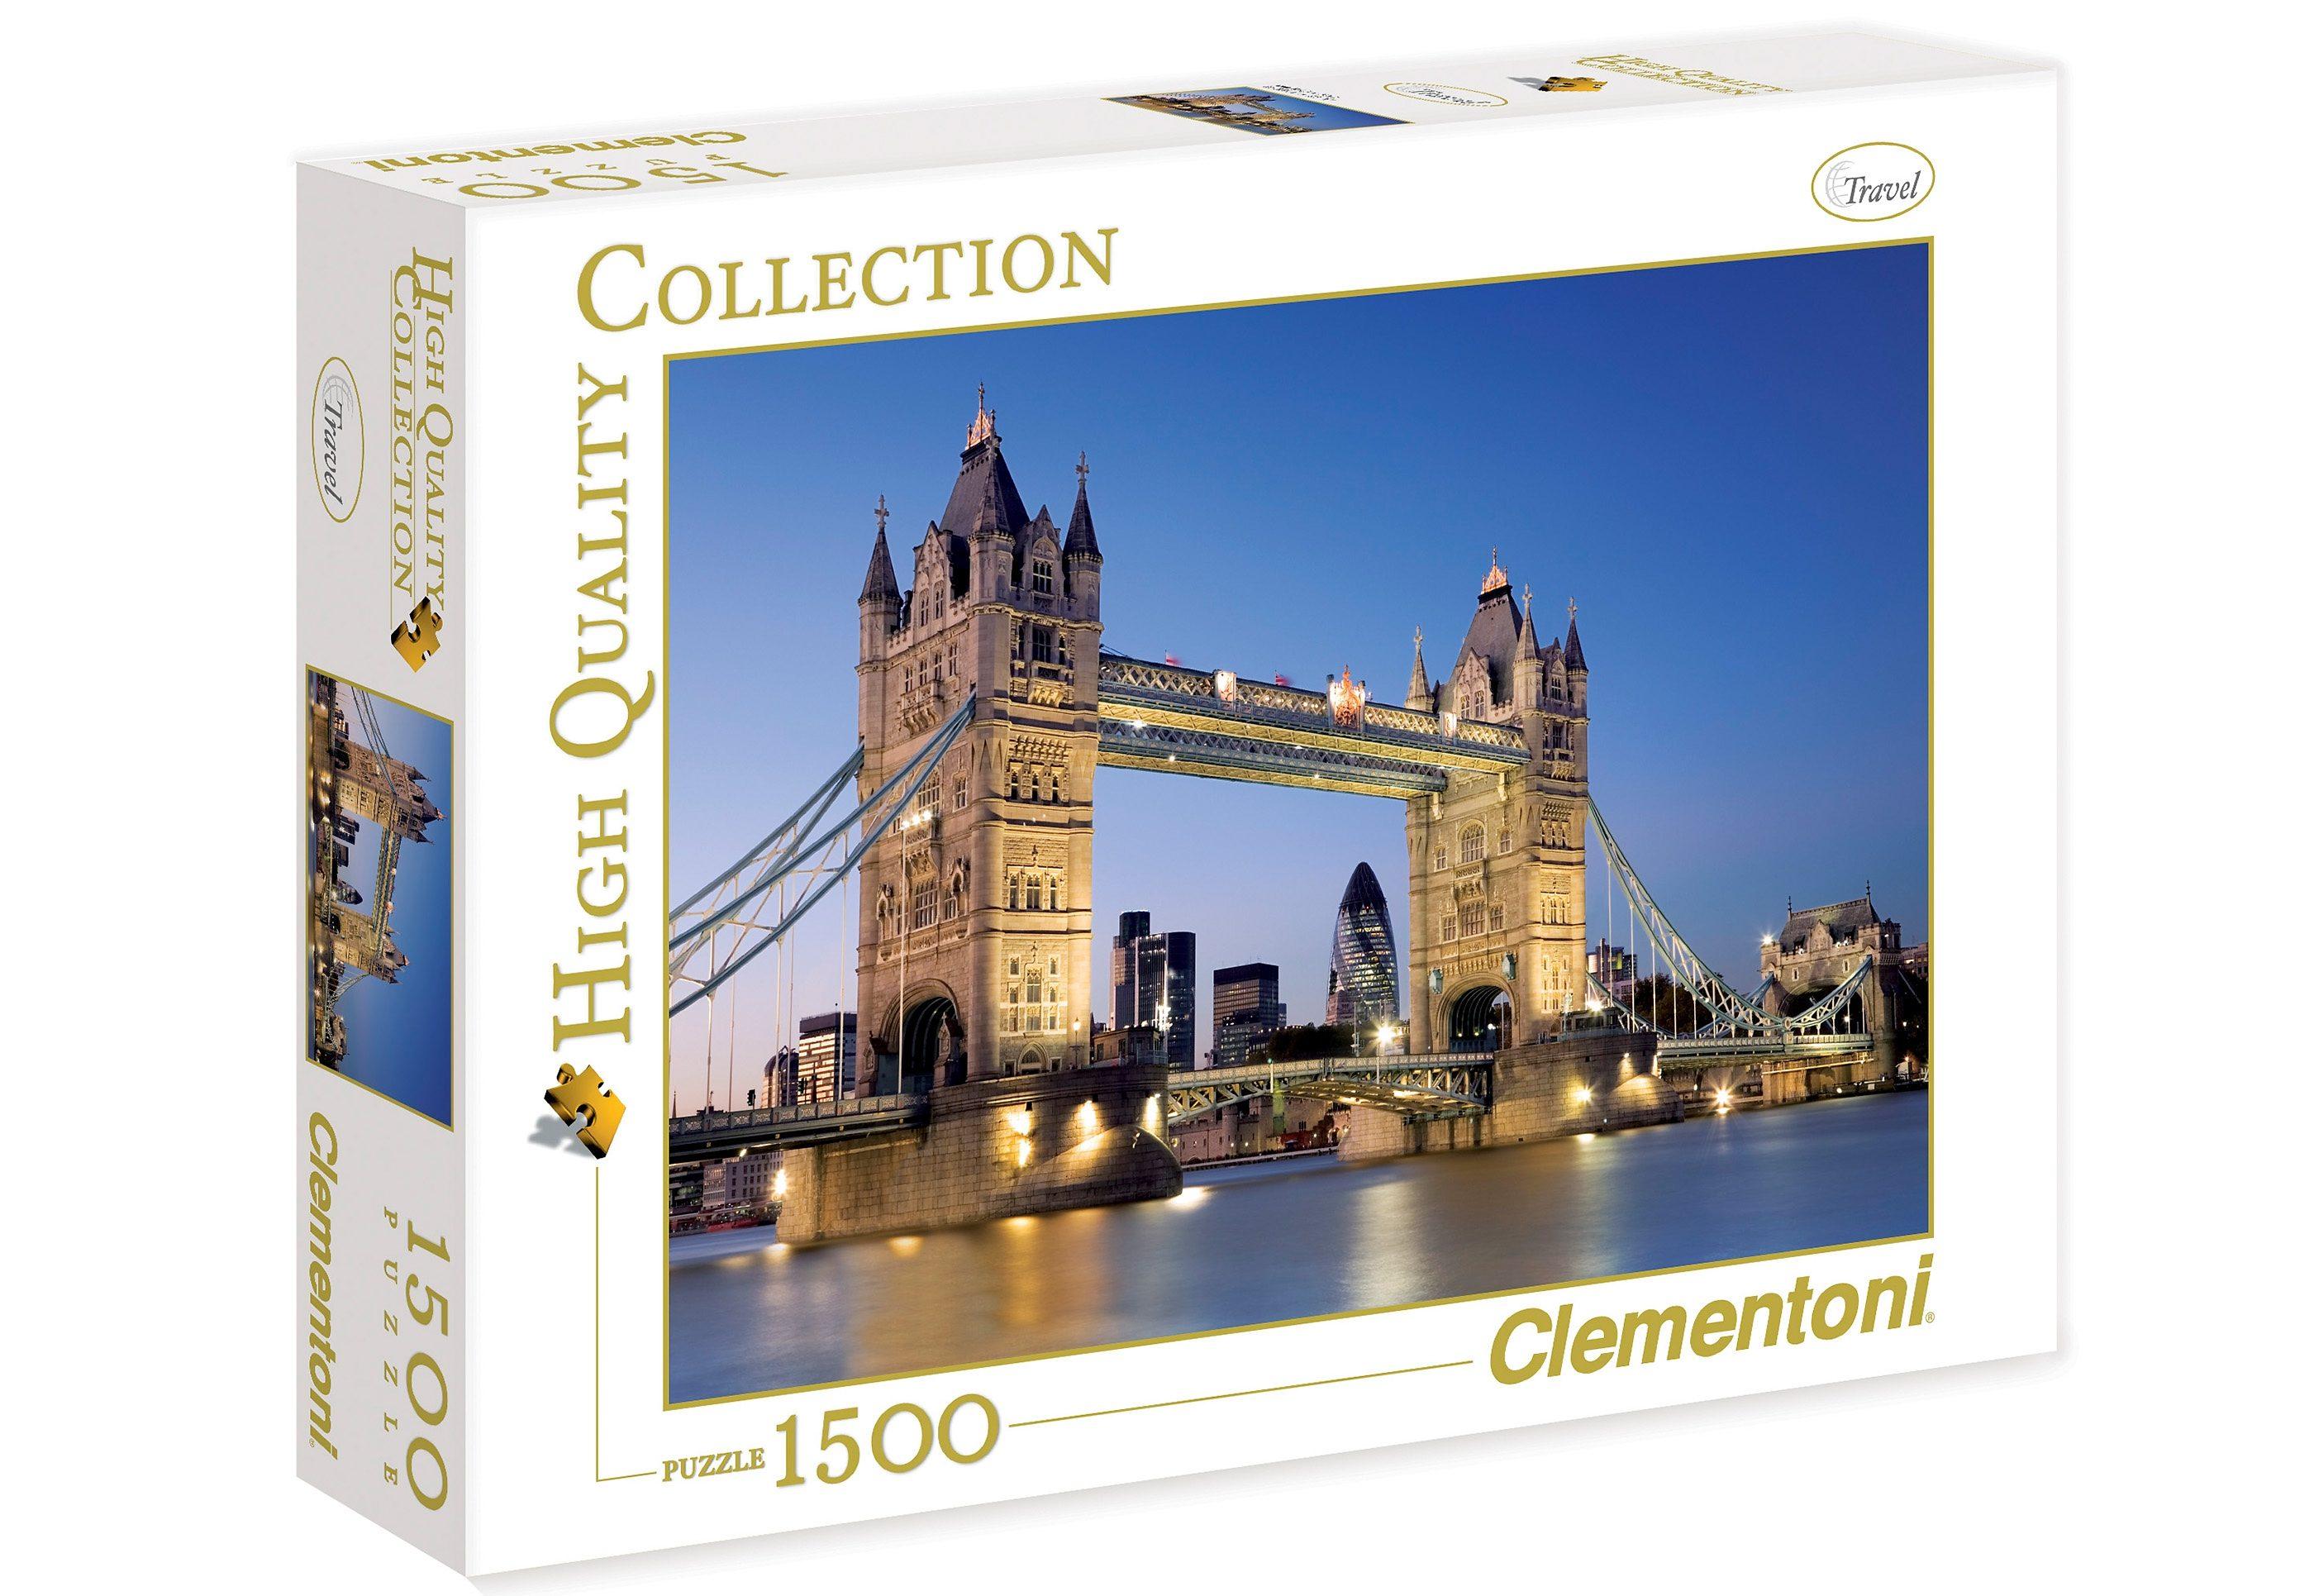 Clementoni Puzzle, 1500 Teile, »Tower Bridge«